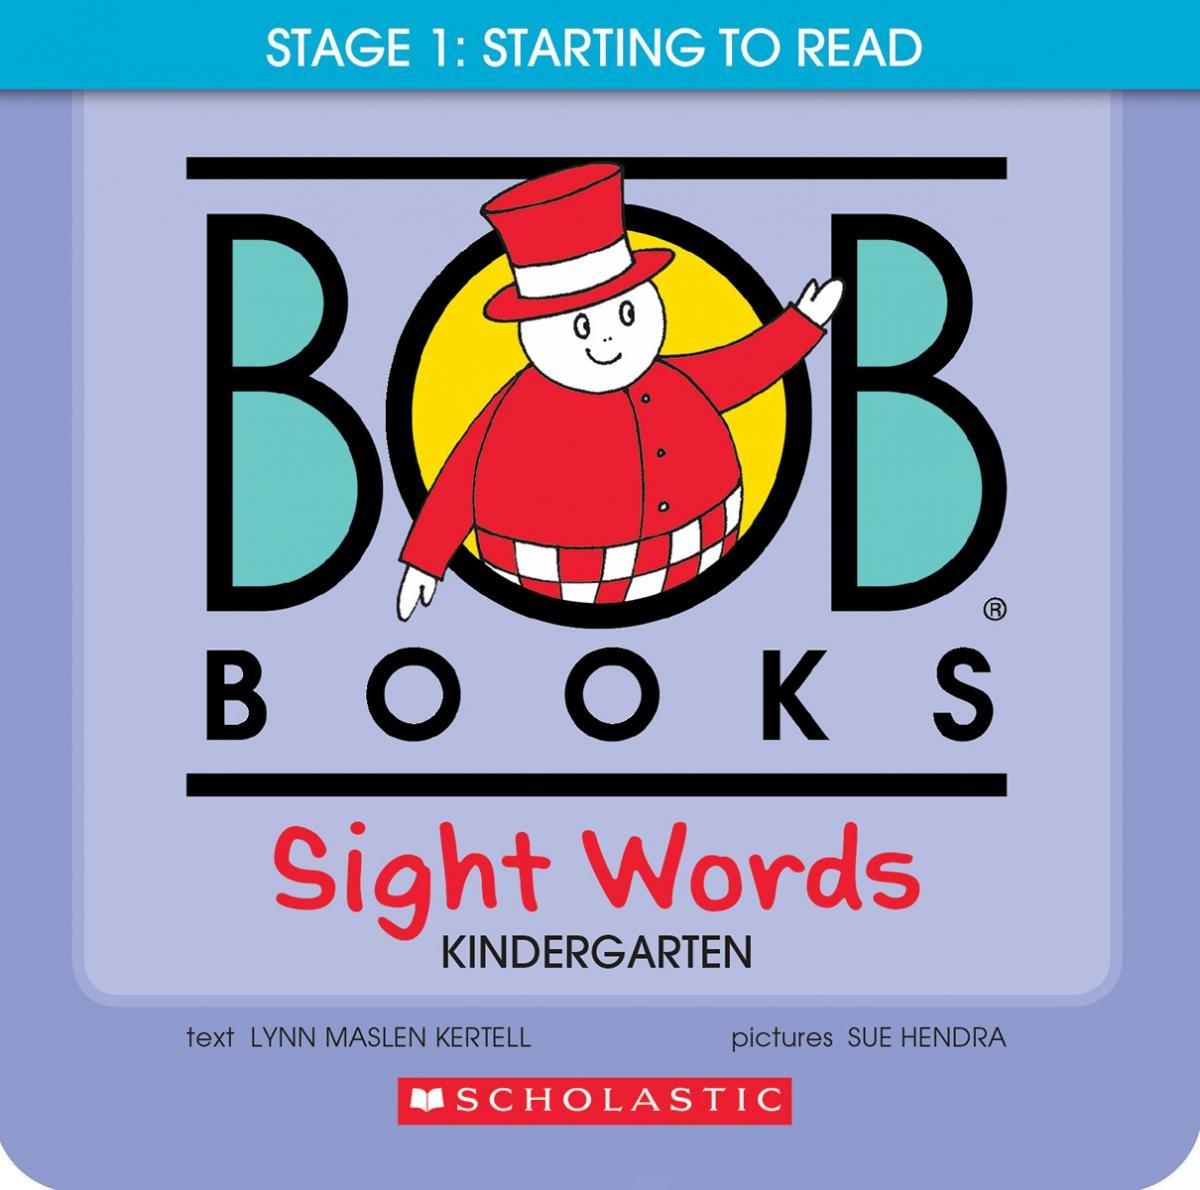 Amazon.com: Bob Books Sight Words: Kindergarten (9780545019231 ...